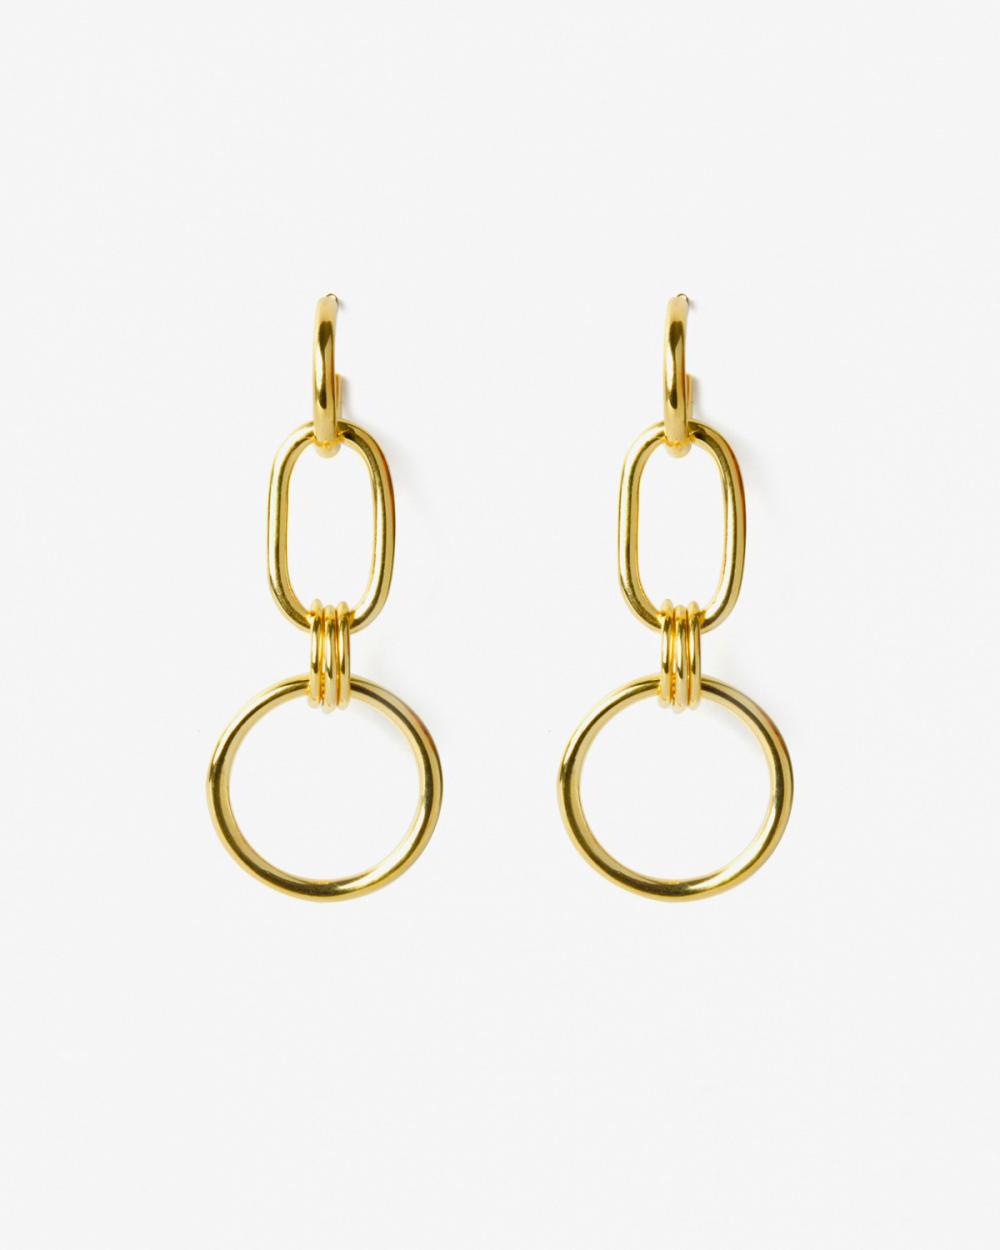 Earrings YELLOW GOLD GAMMA EARRINGS NOVE25